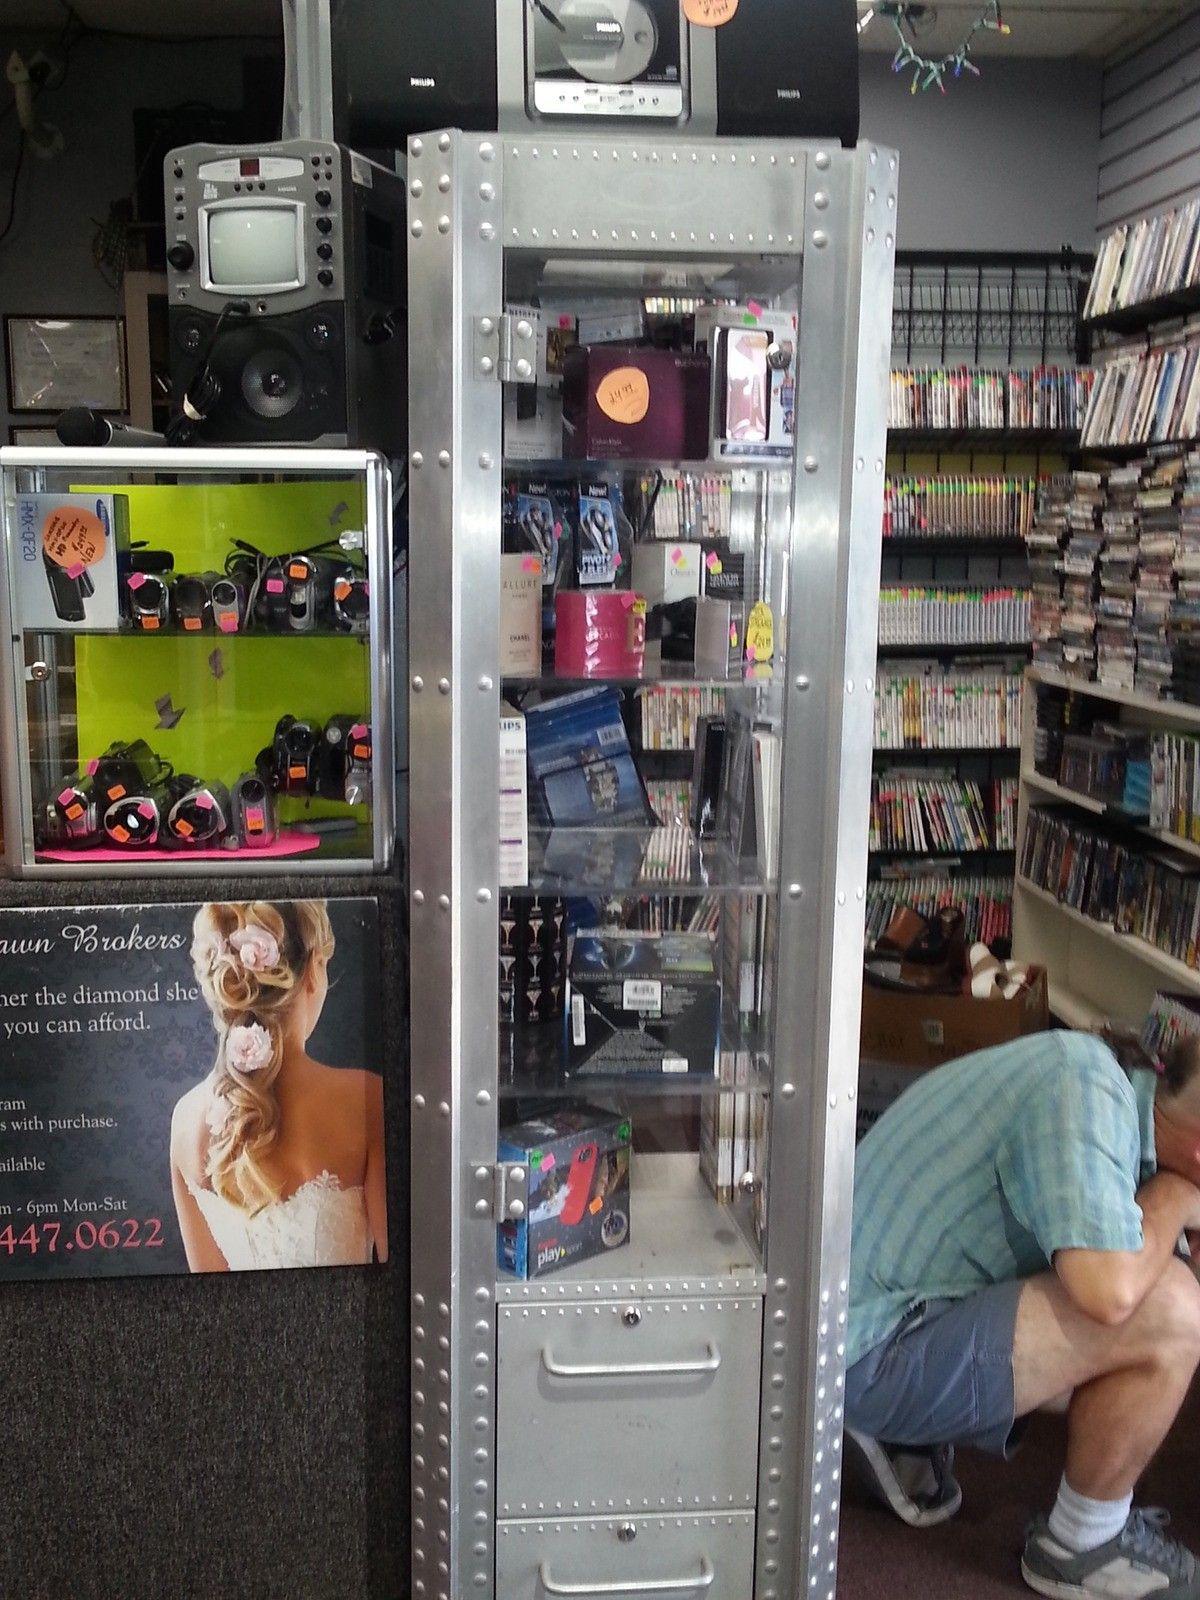 UUUHHHGG Local Pawn Shop Has This - 8pap.jpg